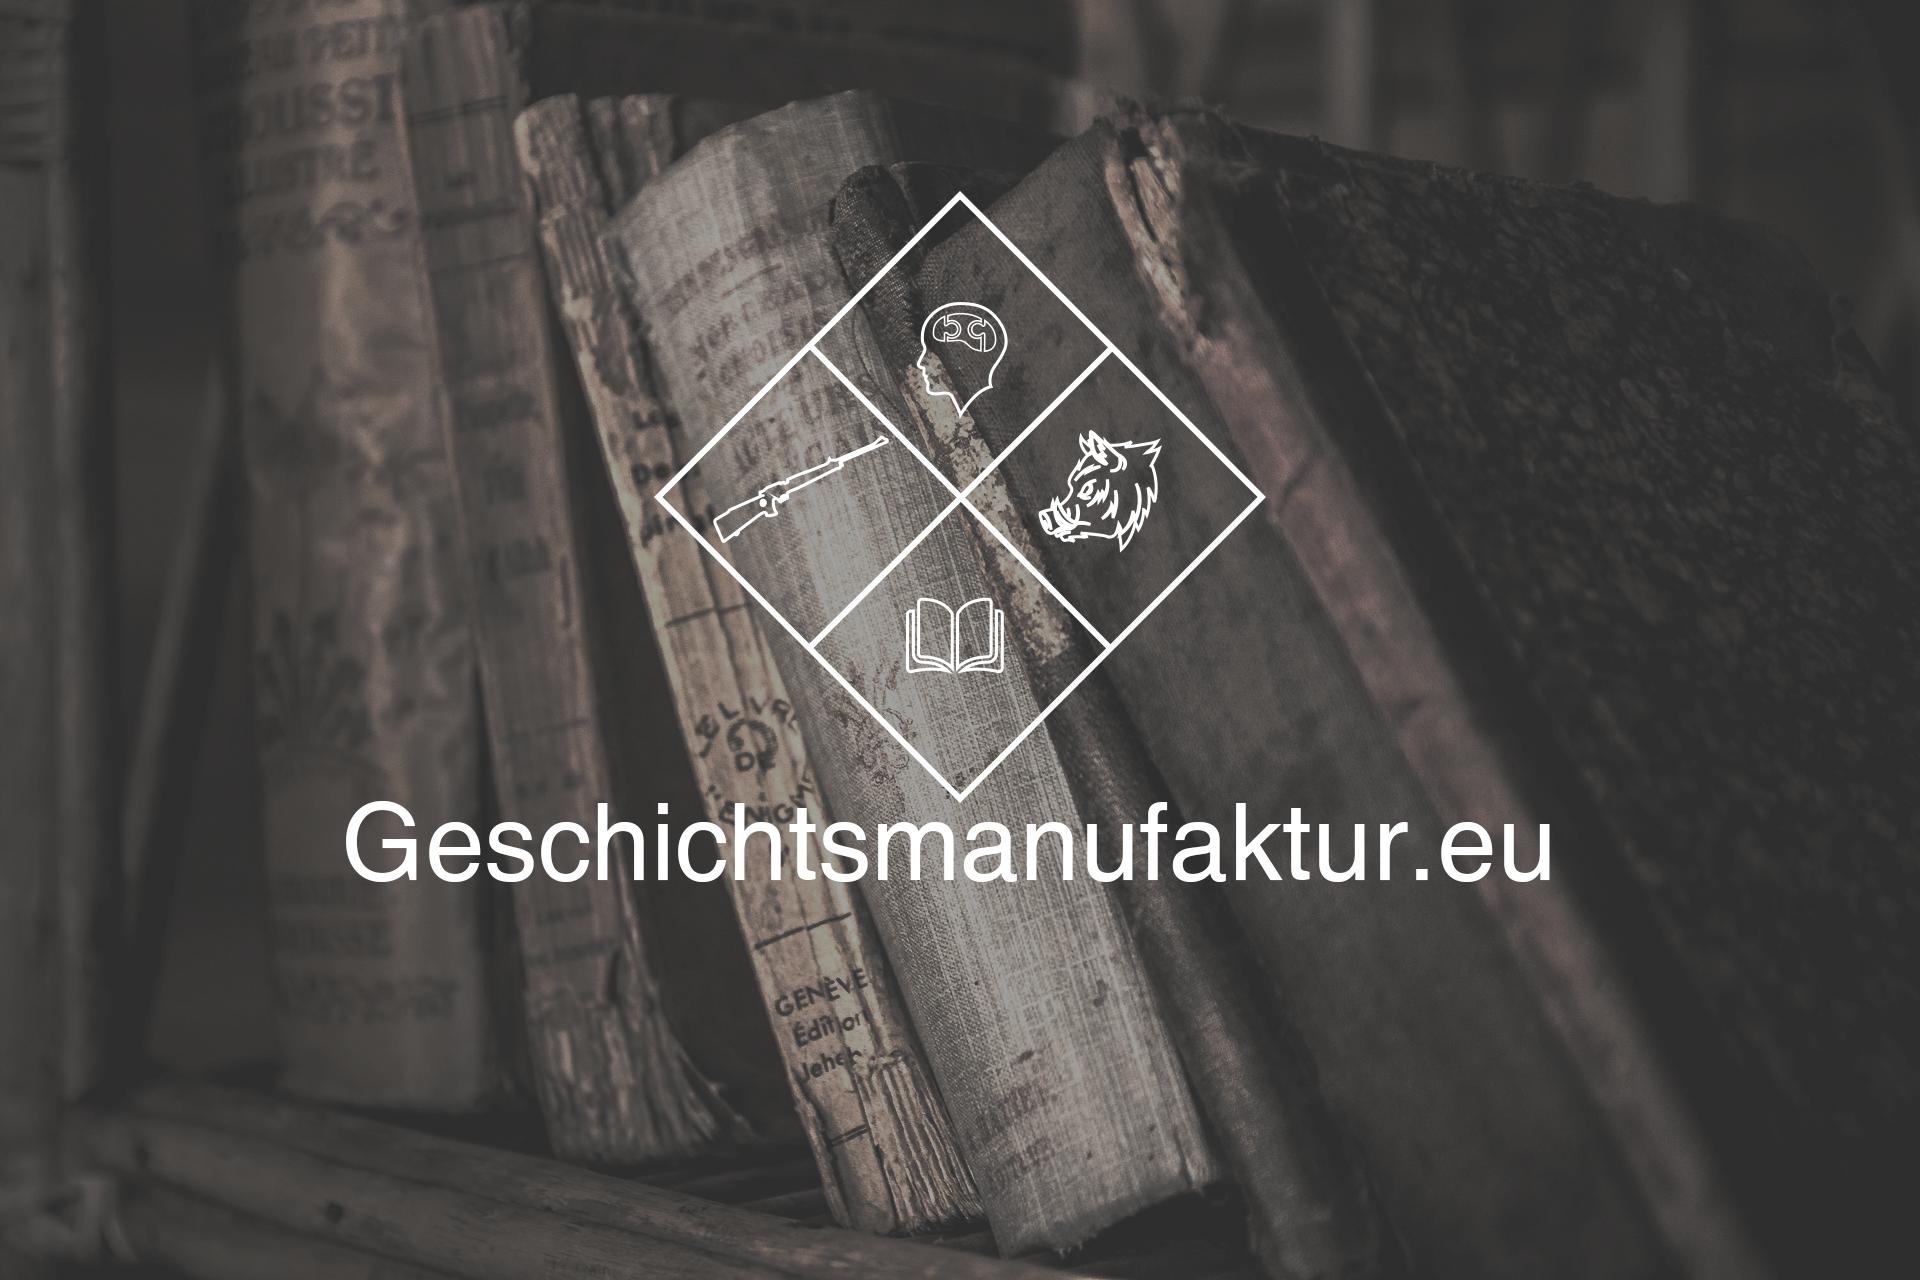 geschichtsmanufaktur.eu